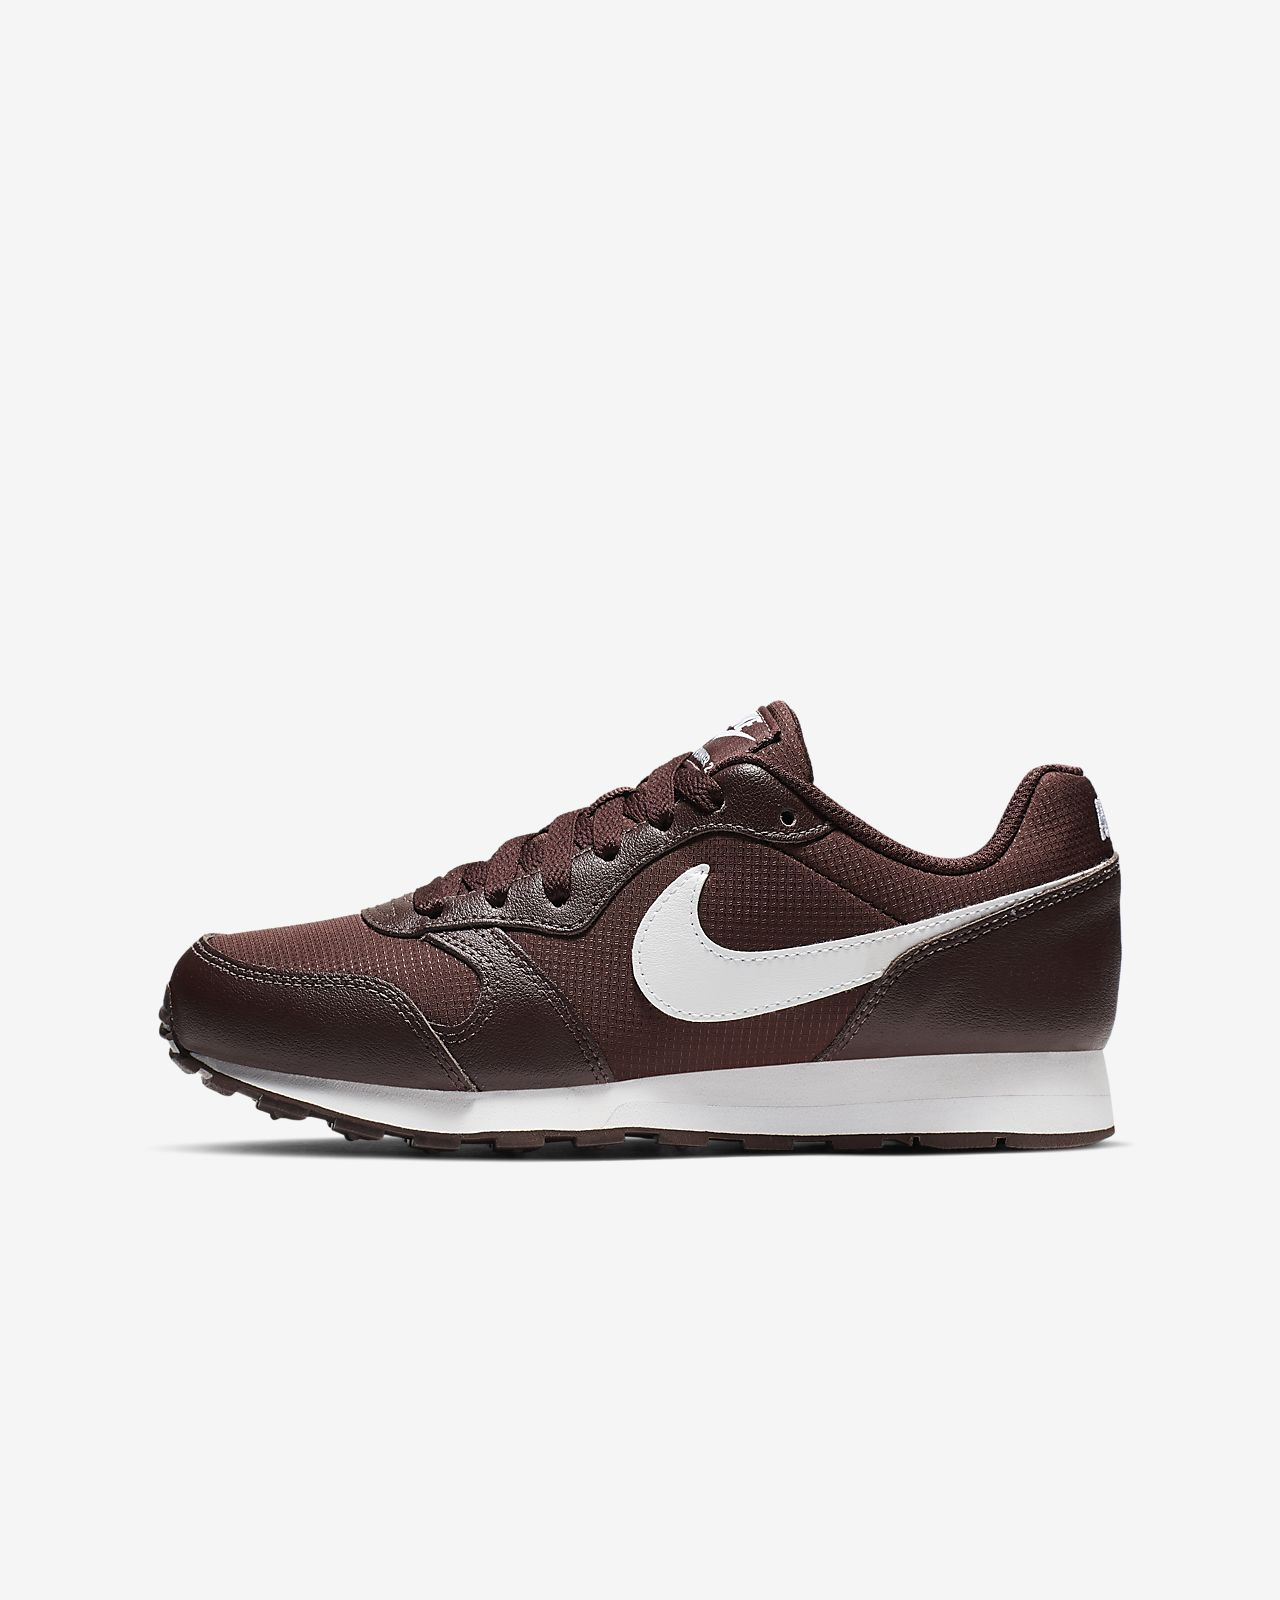 Zapatilla Nike Md Runner 2 Pe AT6287 200 BLACK FRIDAY Deportes Manzanedo